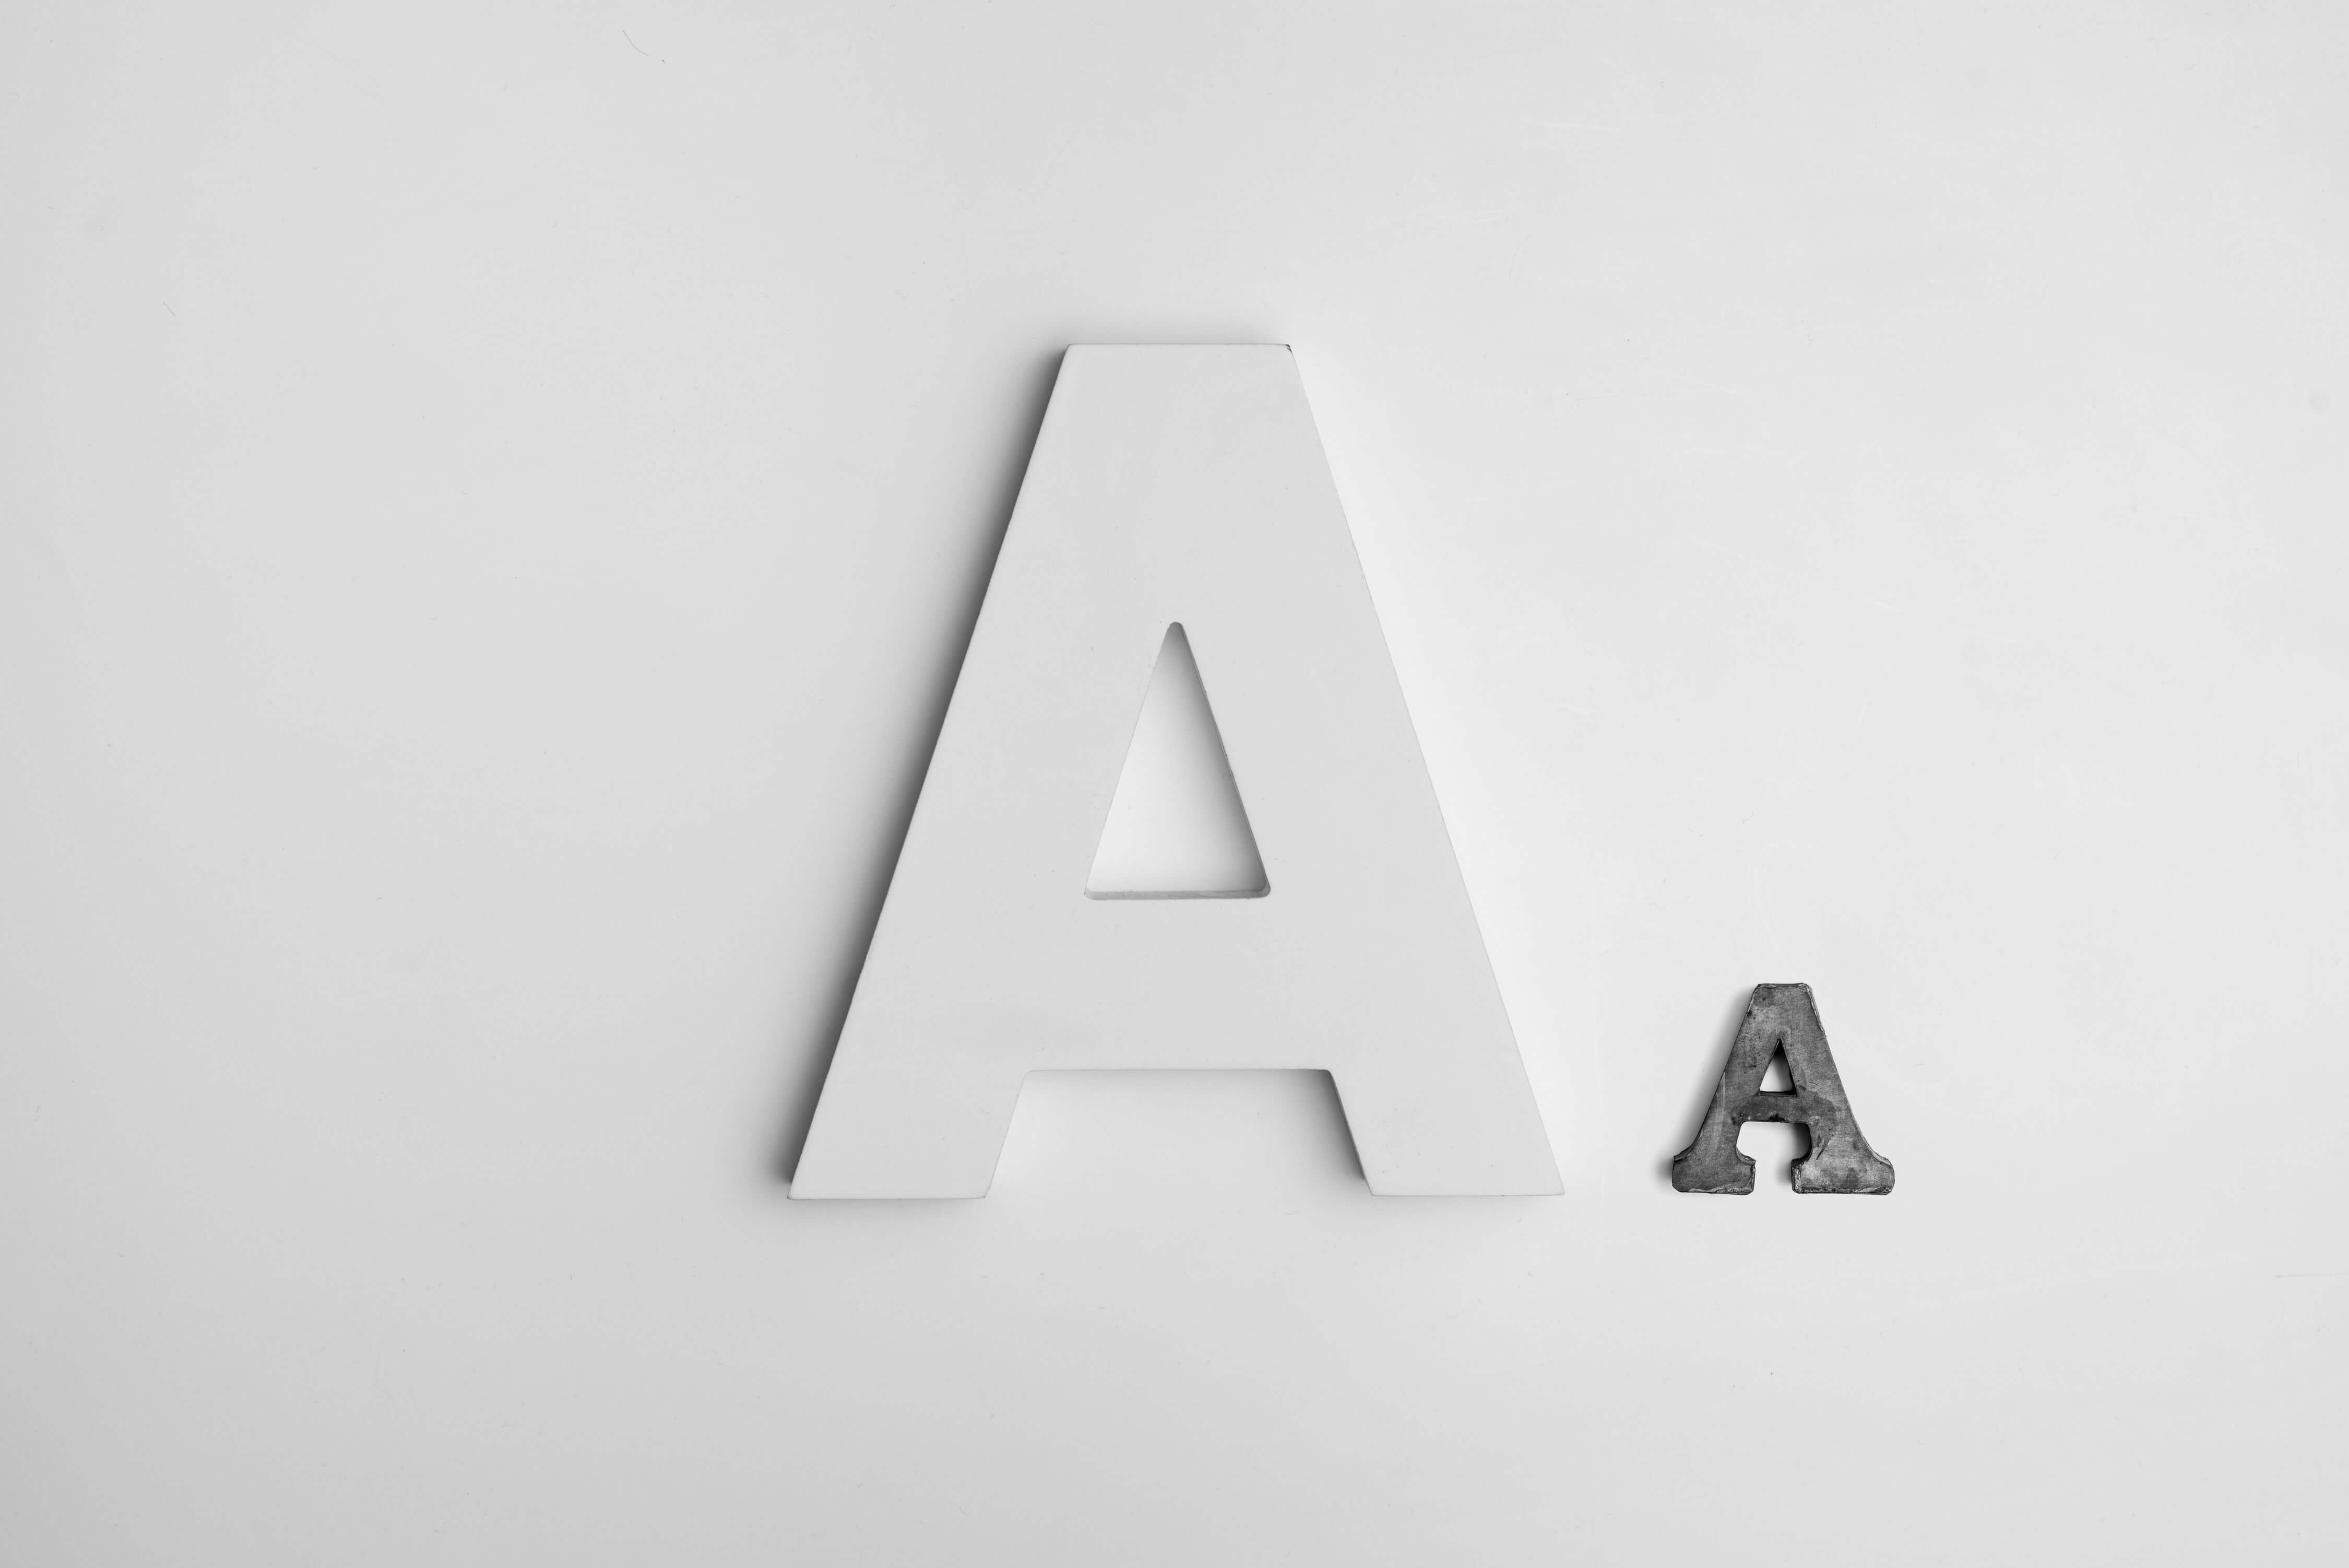 Premiere Proで字幕を大量に入れる方法|効率良くテロップを入れよう!